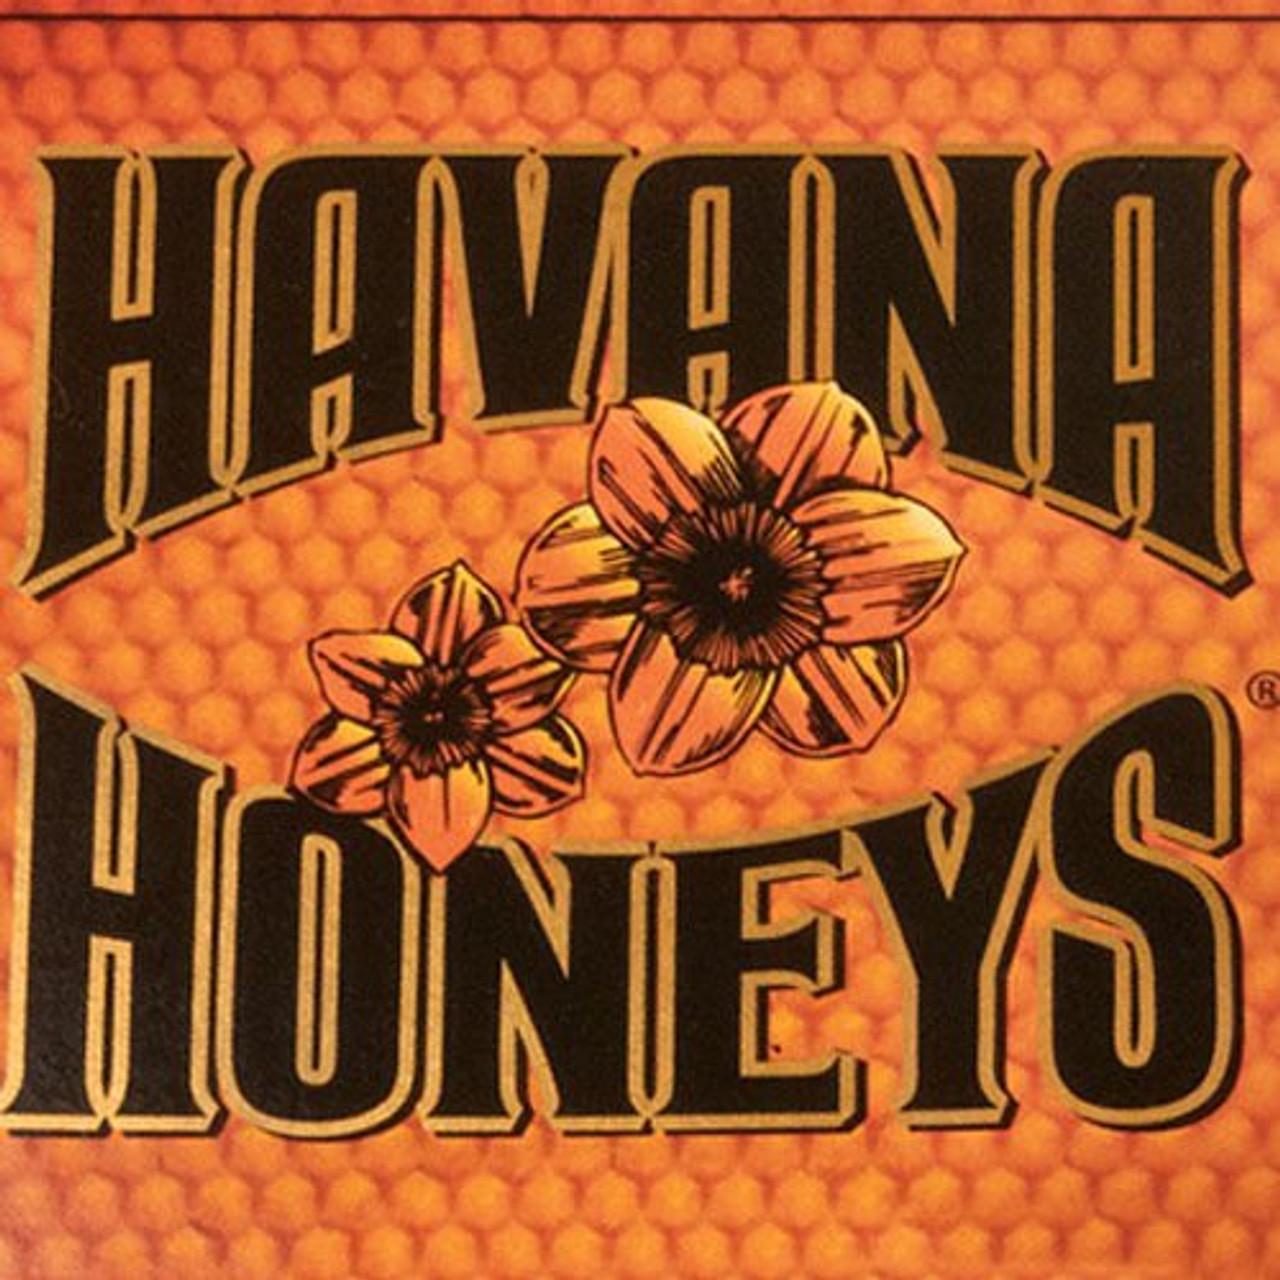 Havana Honeys Sweet Honey Cigars - 4.13 x 33 (10 Packs of 2 (20 total))